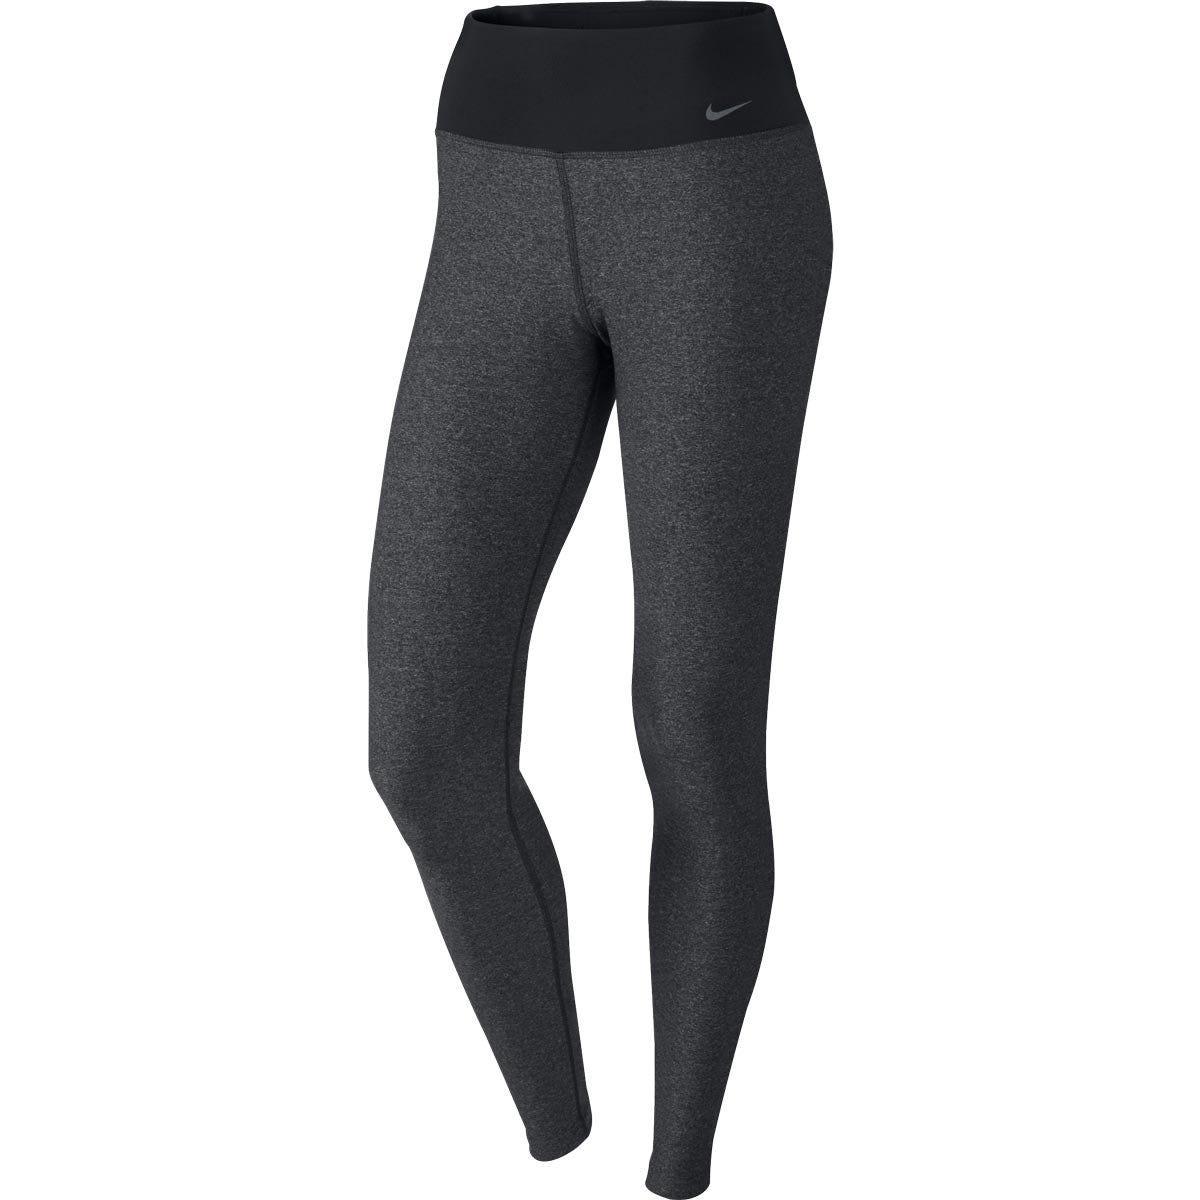 Womens Large Legend 2.0 Softball Training Pants - Gray/Black by Nike